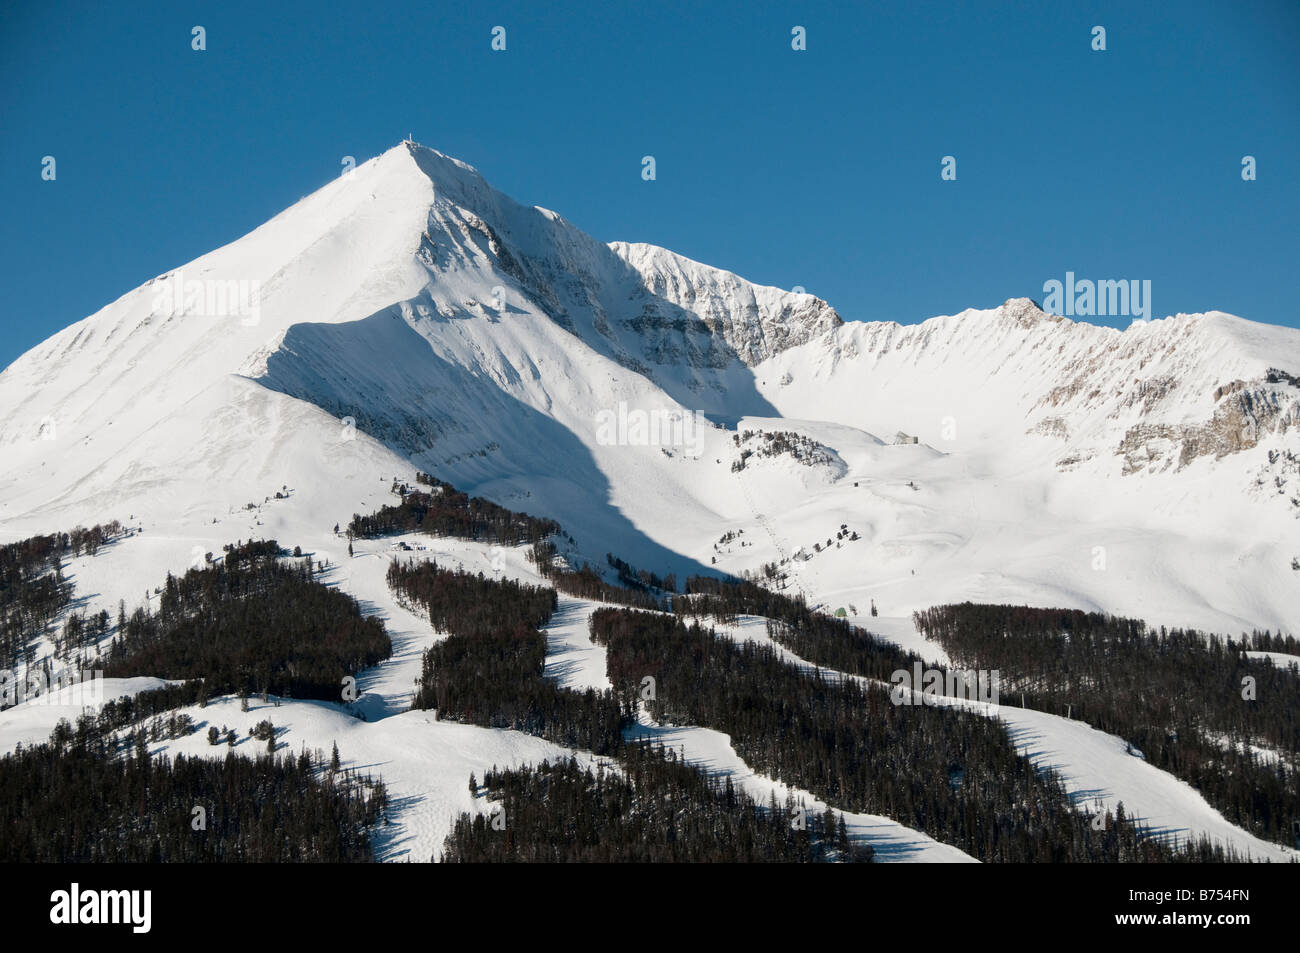 big mountain ski resort montana stock photos & big mountain ski